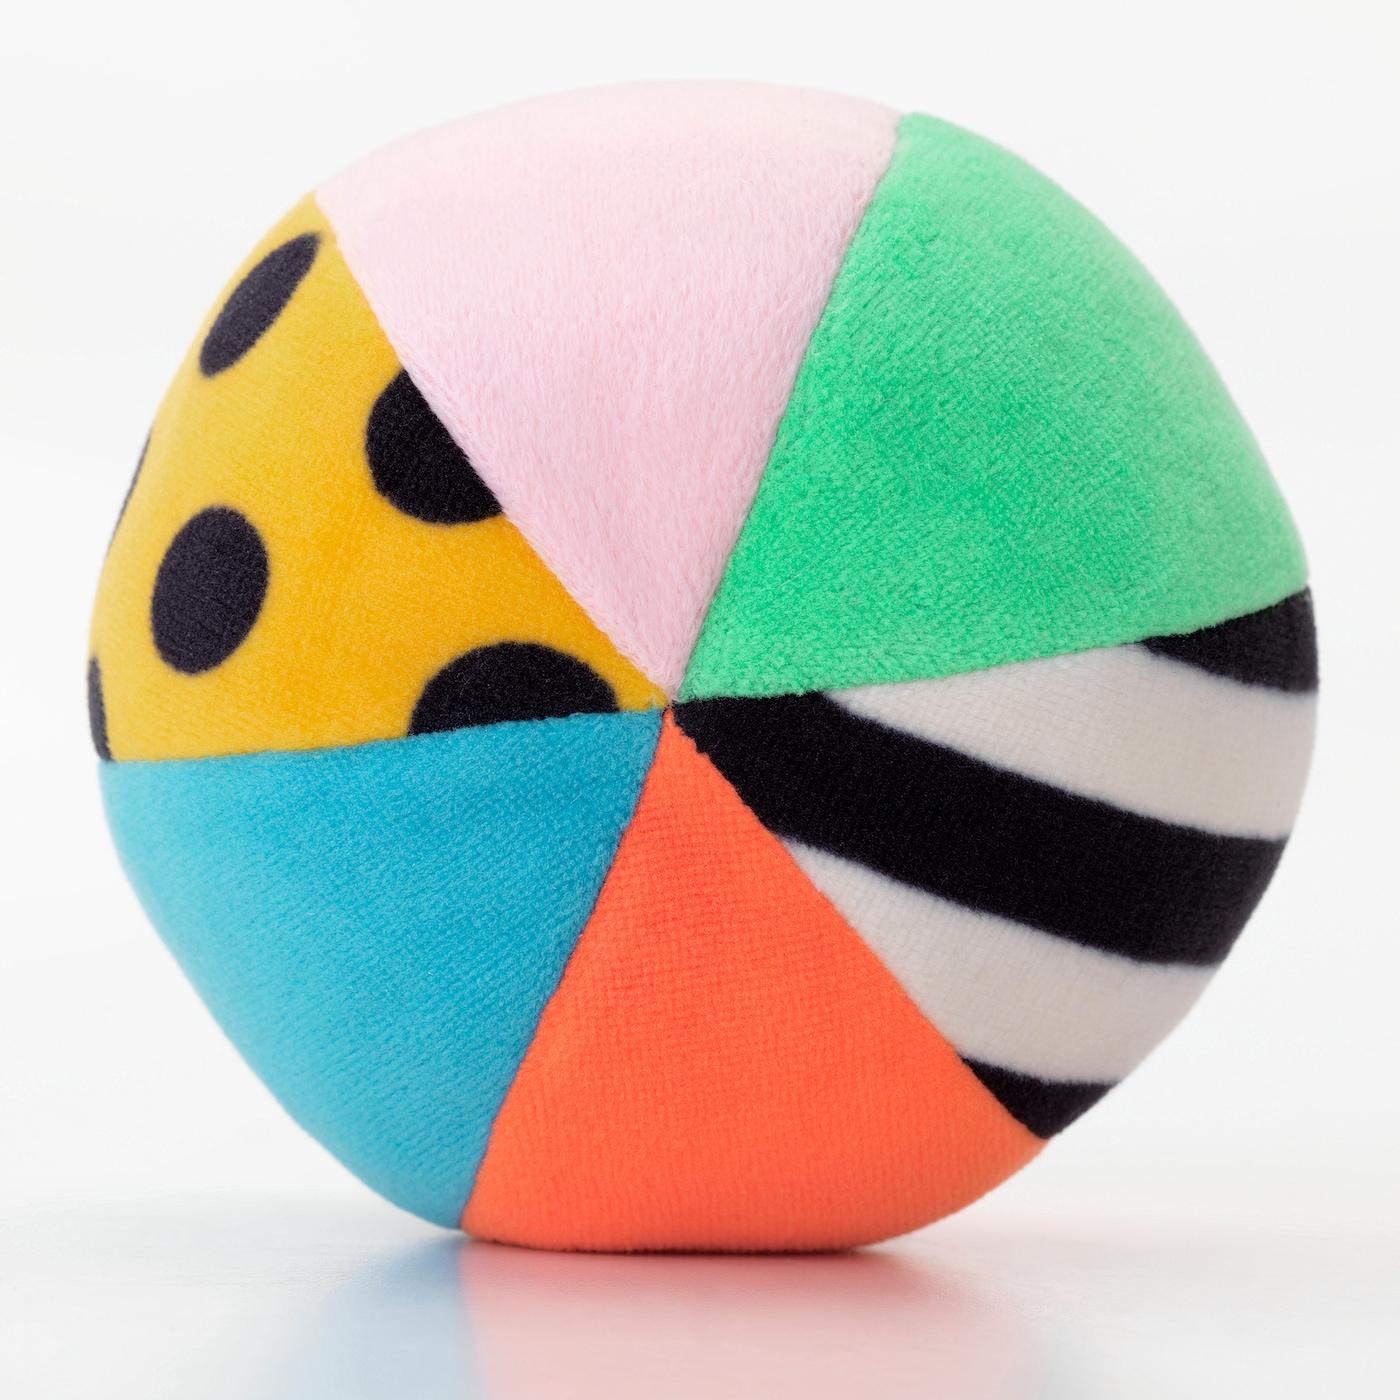 KLAPPA Soft toy, ball, multicolour